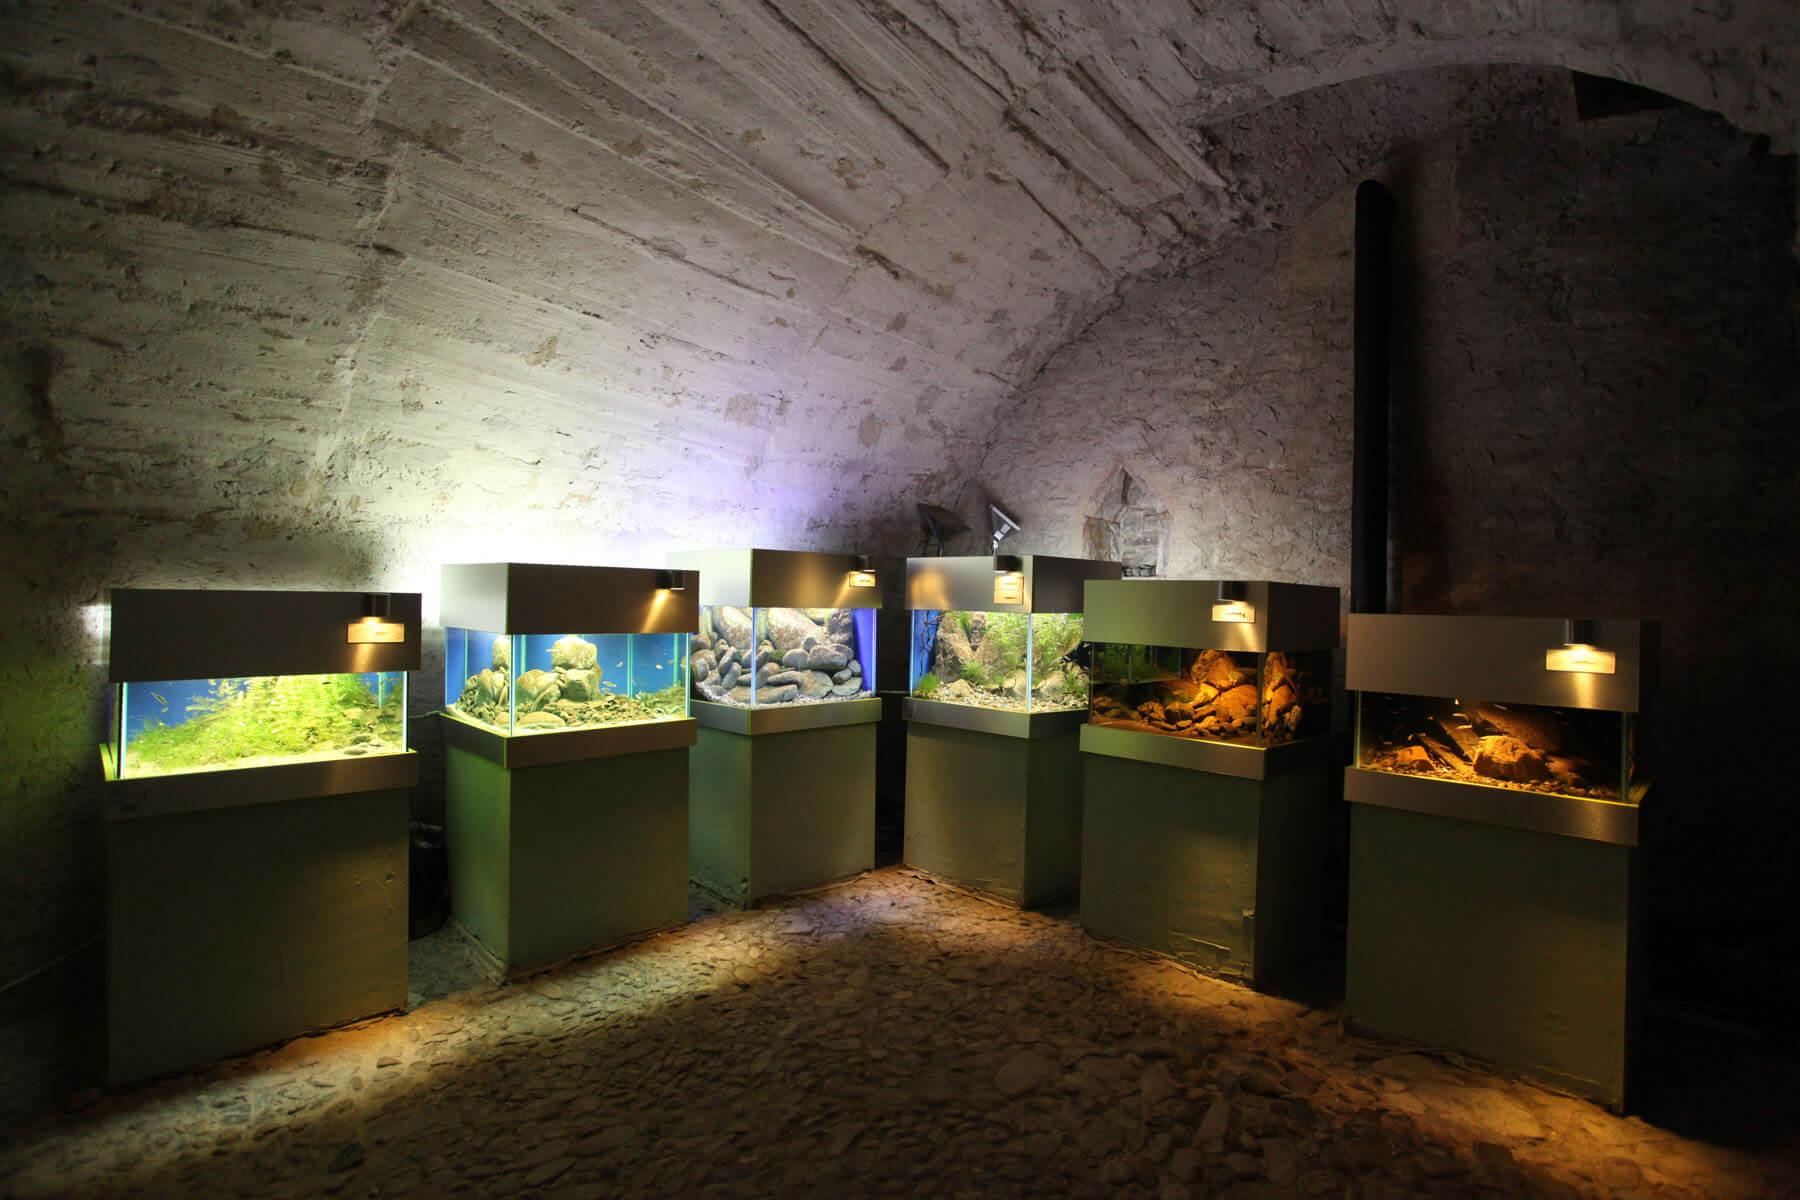 Akvárium Pod hladinou Vltavy foto